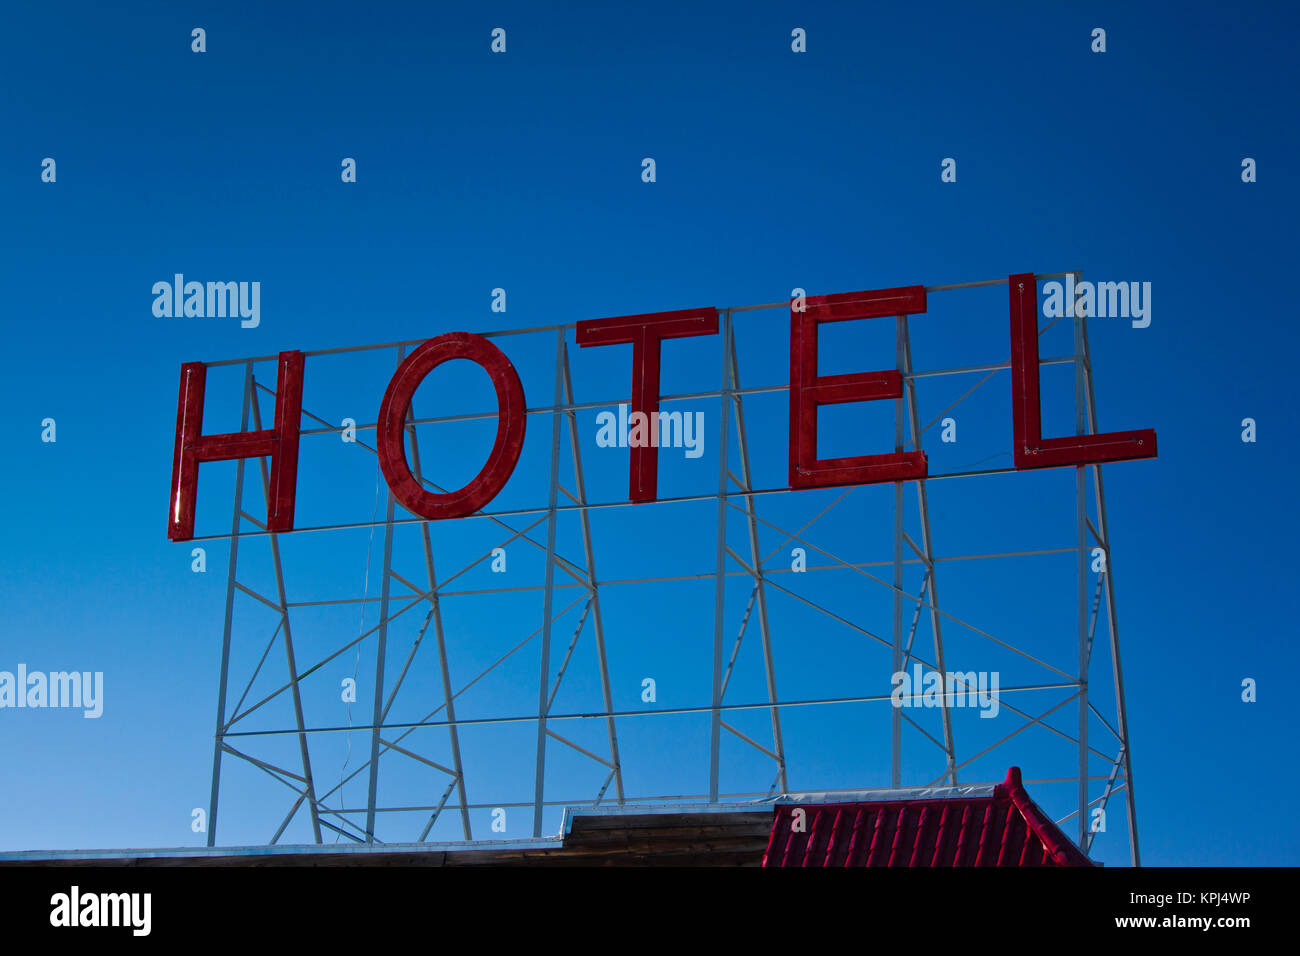 USA, Colorado, Fairplay, hotel sign - Stock Image